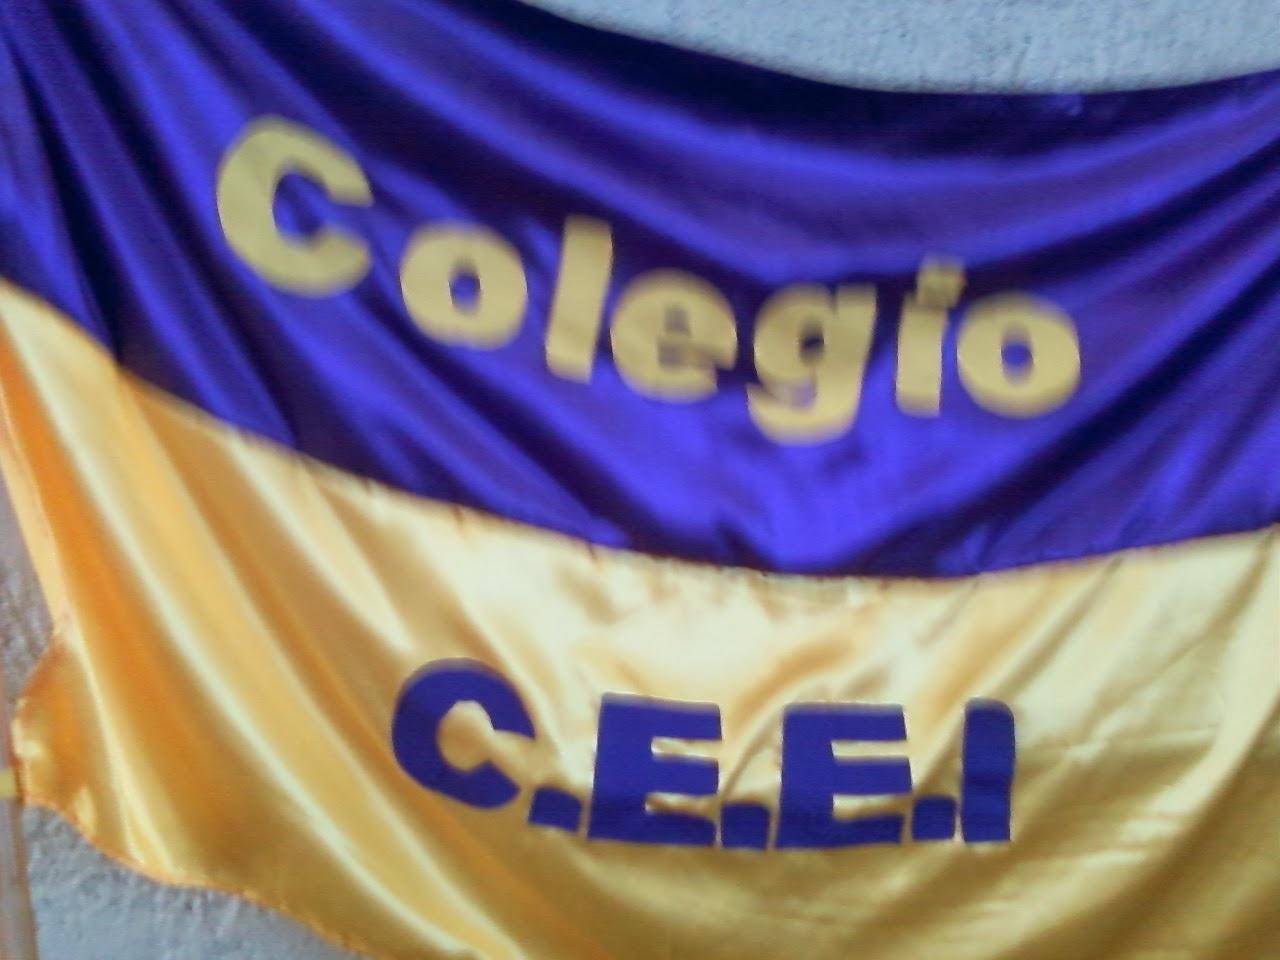 COLEGIO C.E.E.I